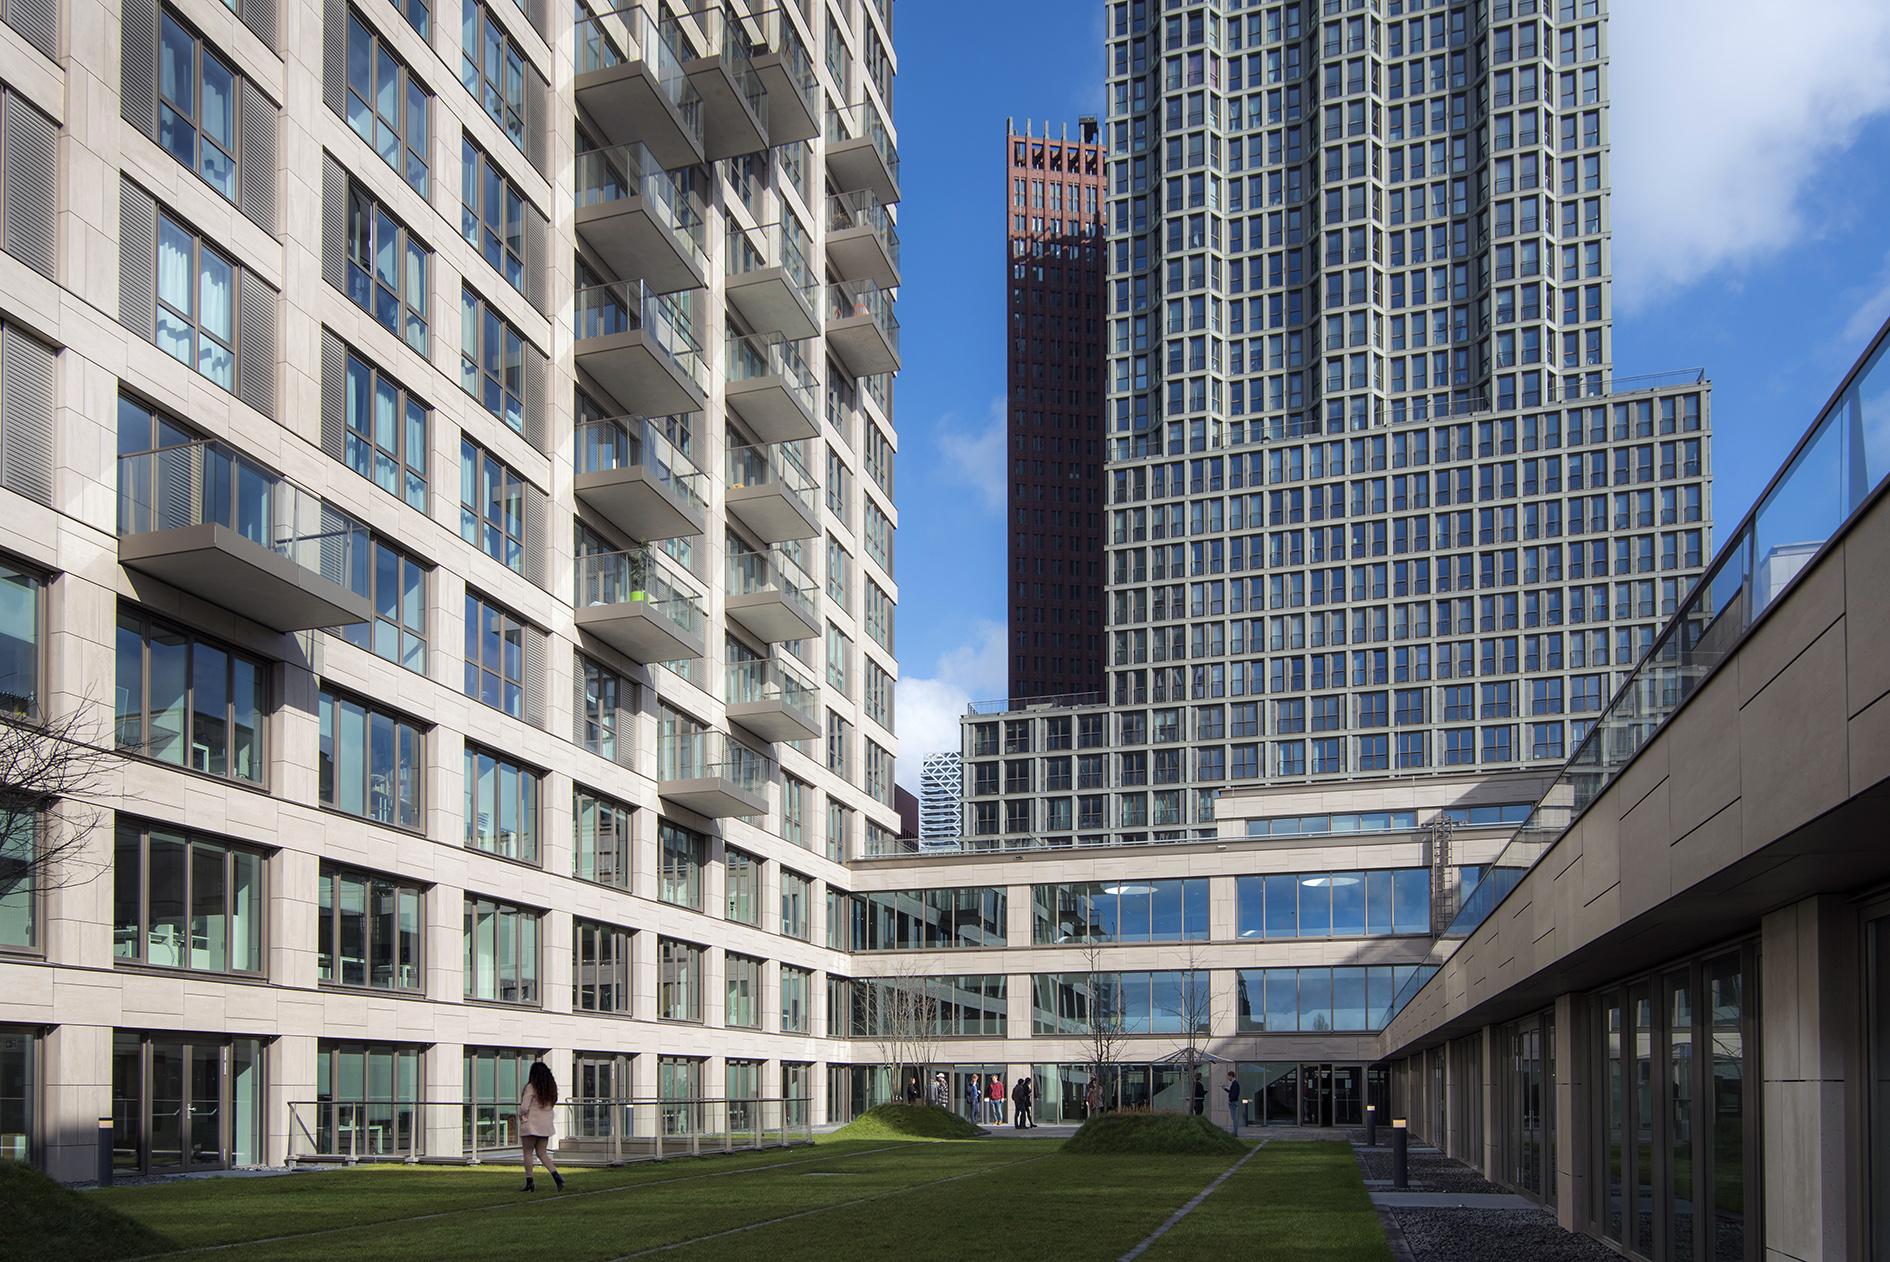 <p>Daktuin Faculteit Campus Den Haag (foto: Peter De Ruig)</p>